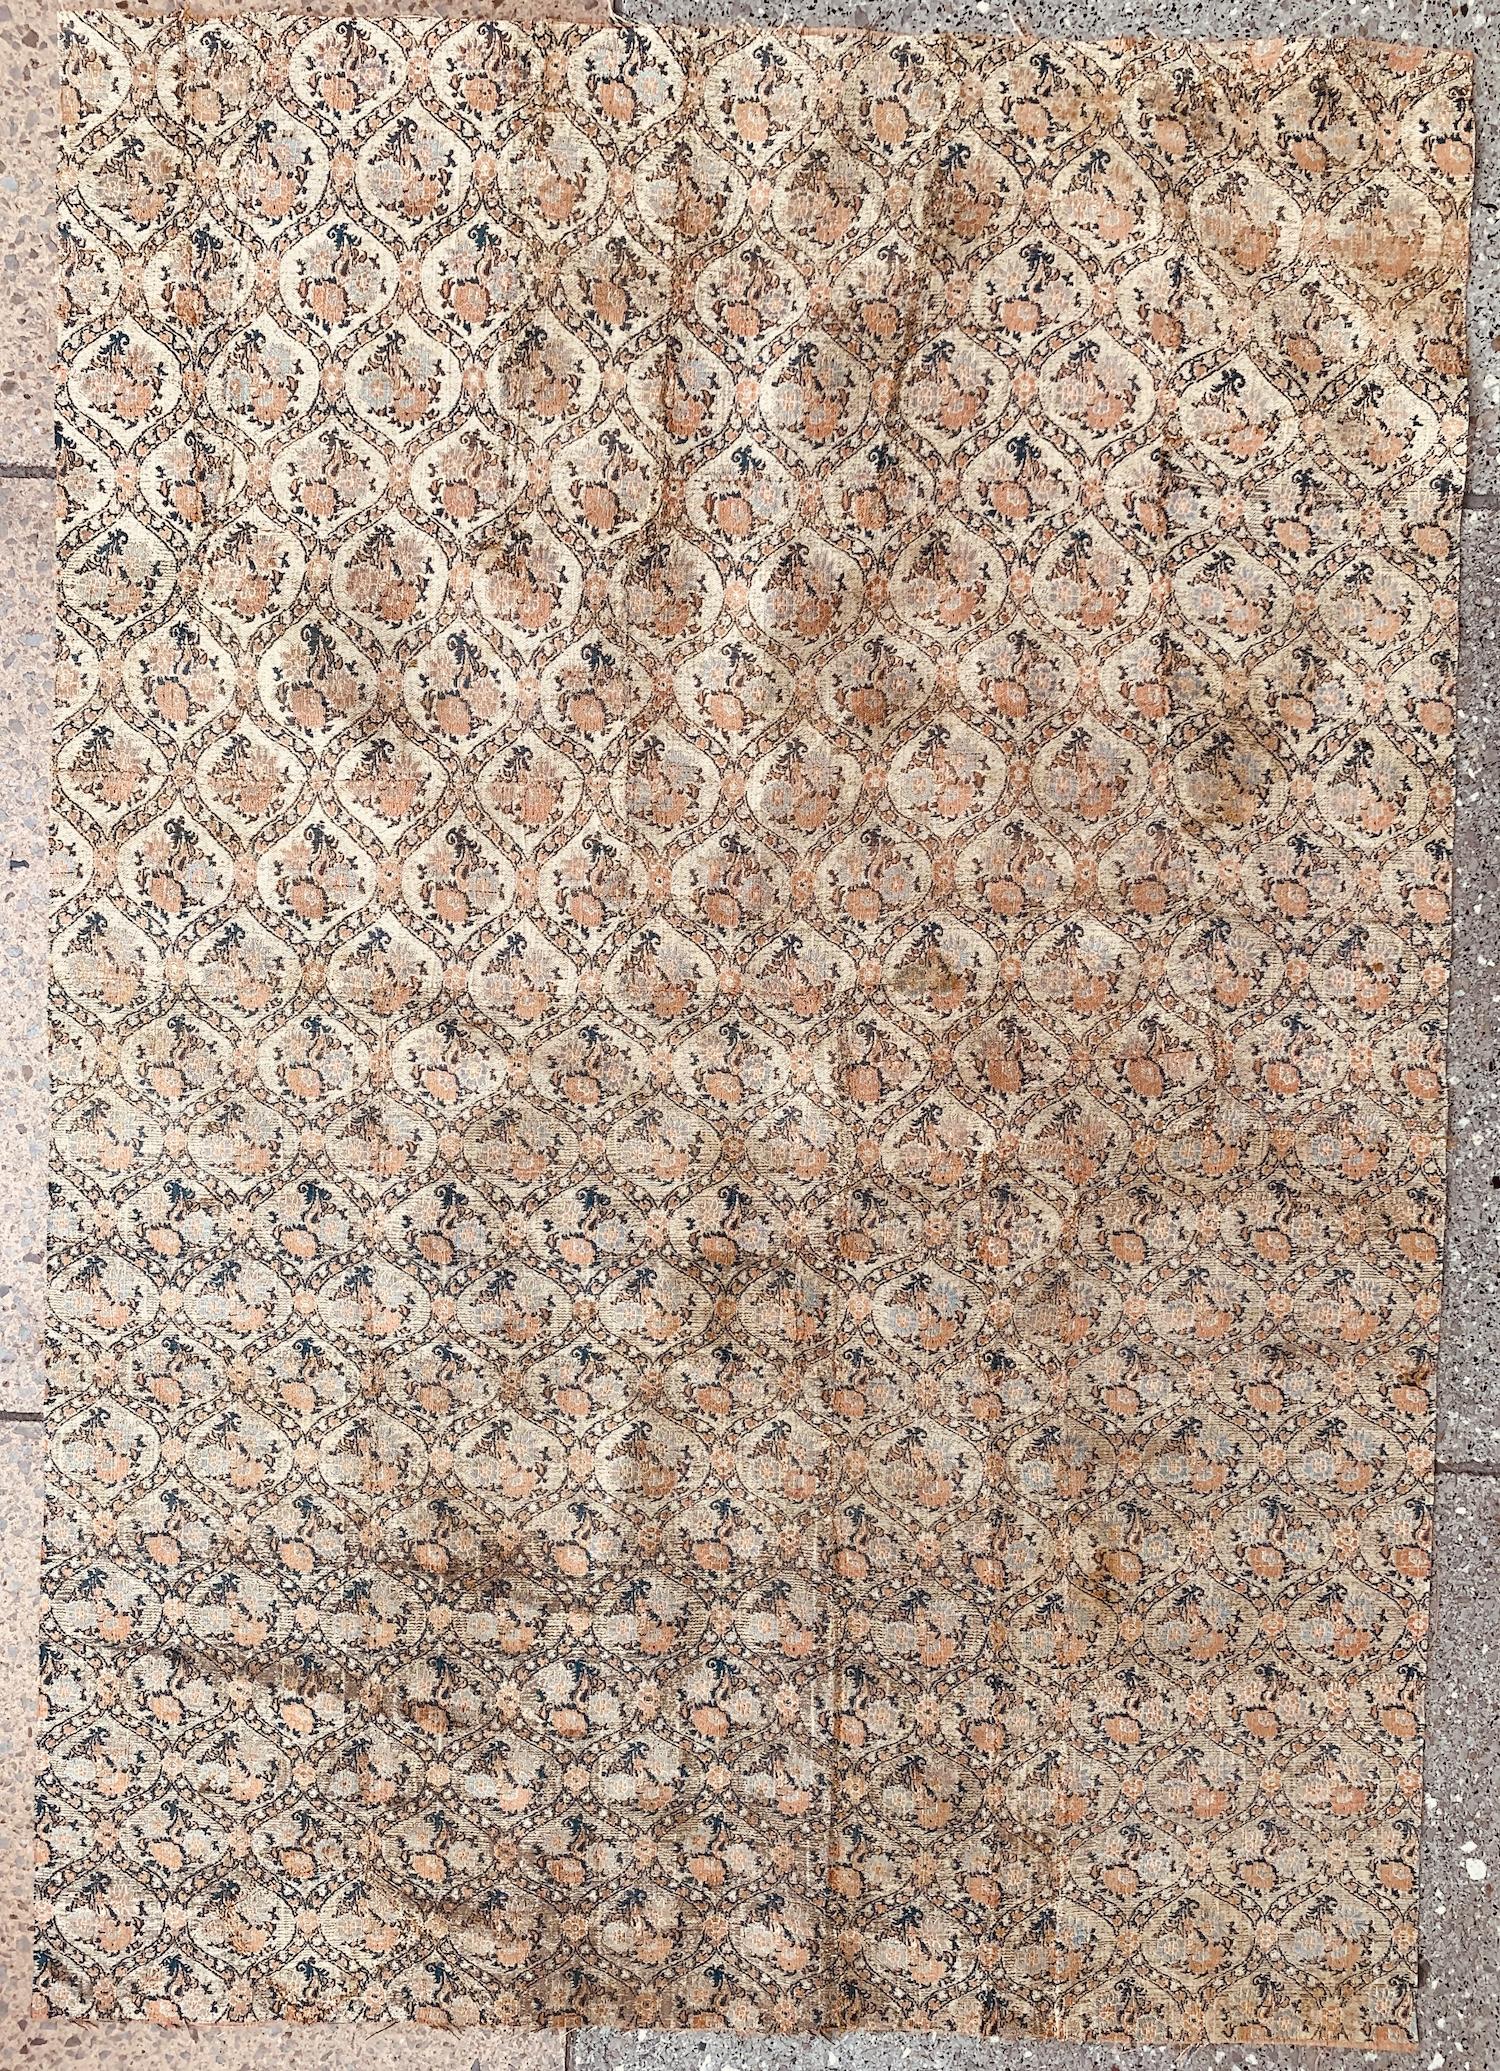 A Safavid textile